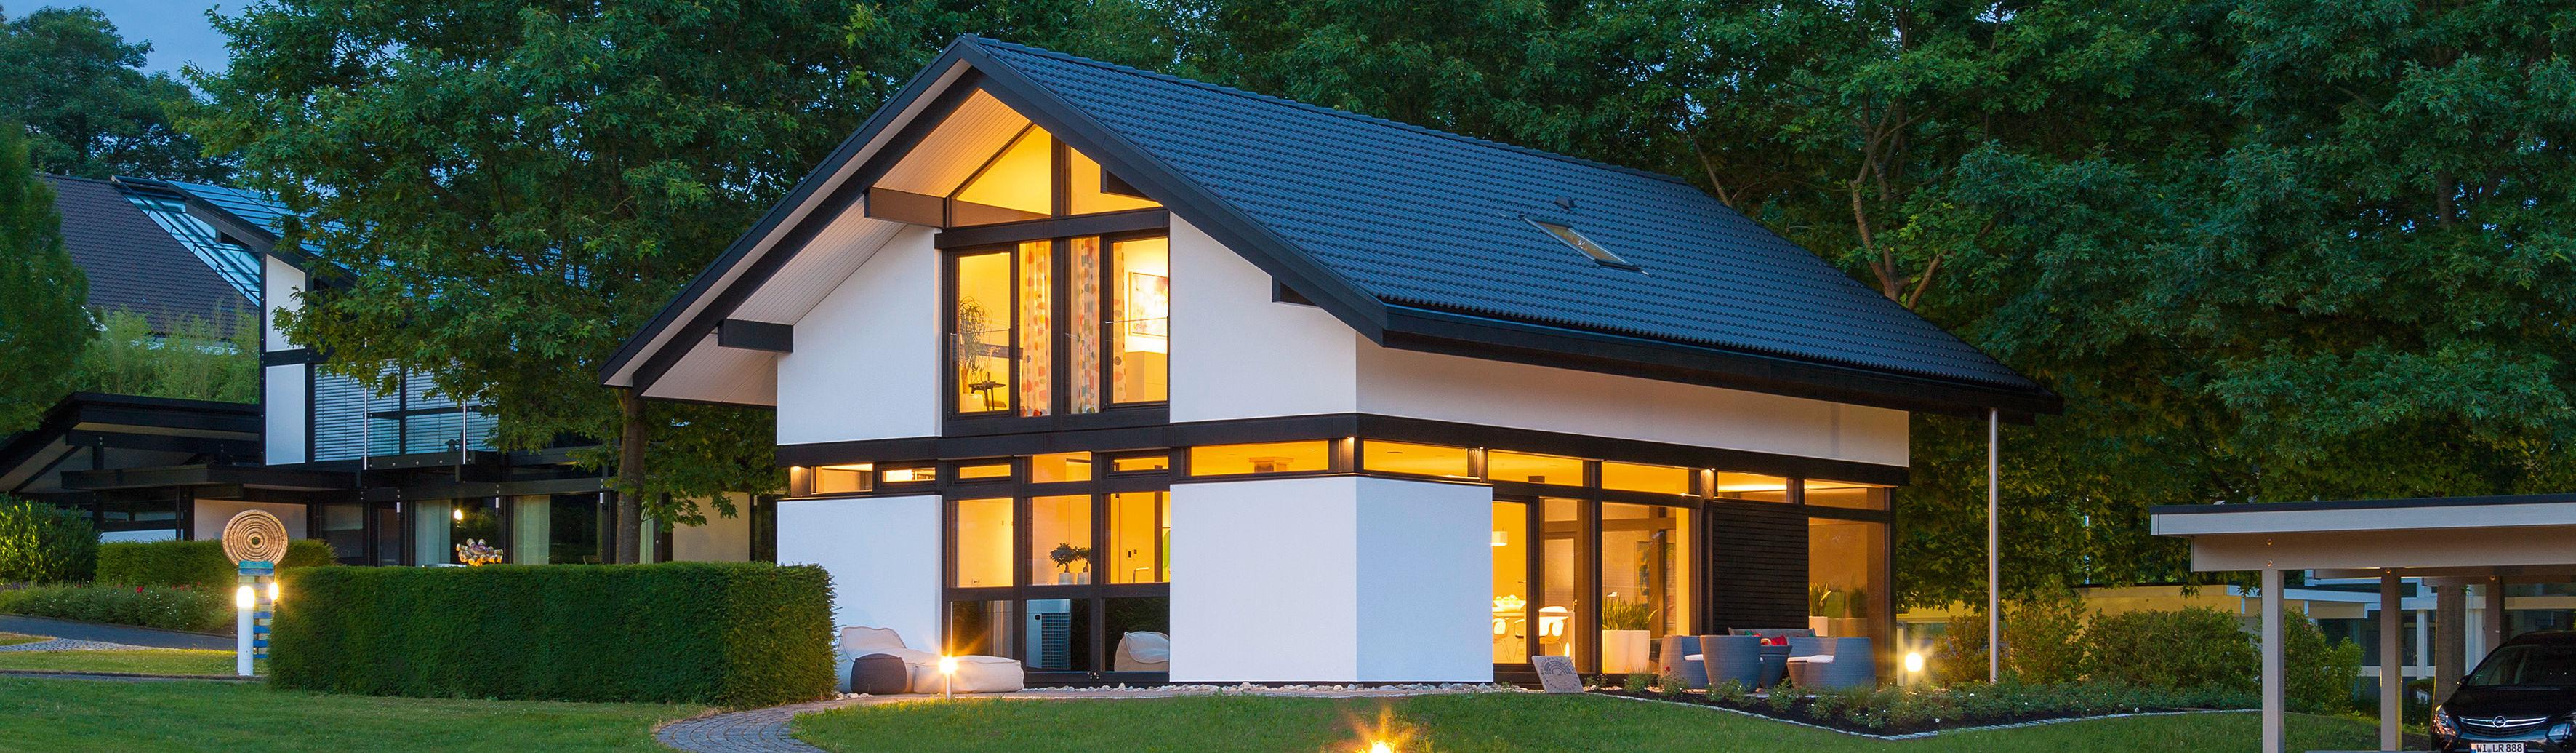 huf haus gmbh u co kg home builders in hartenfels homify. Black Bedroom Furniture Sets. Home Design Ideas